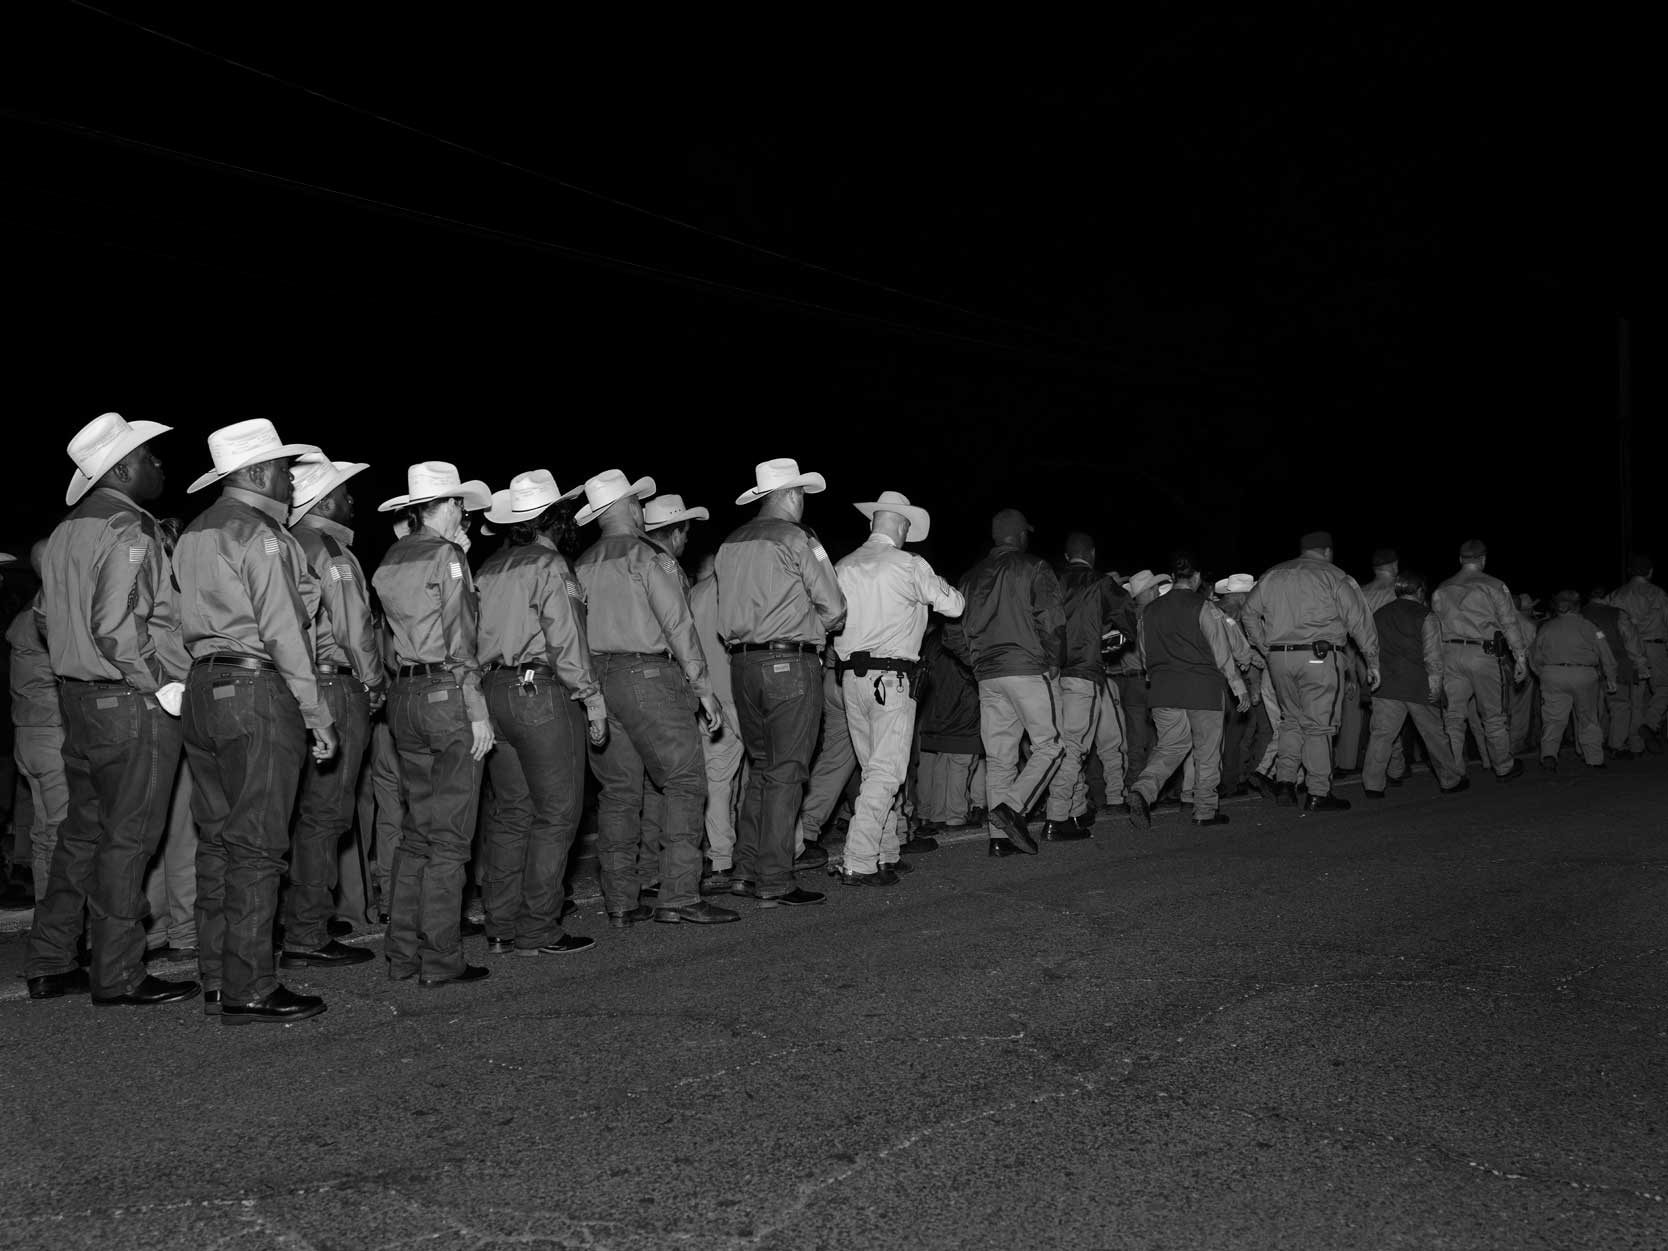 Execution. Huntsville Prison. Hunstville, Texas.